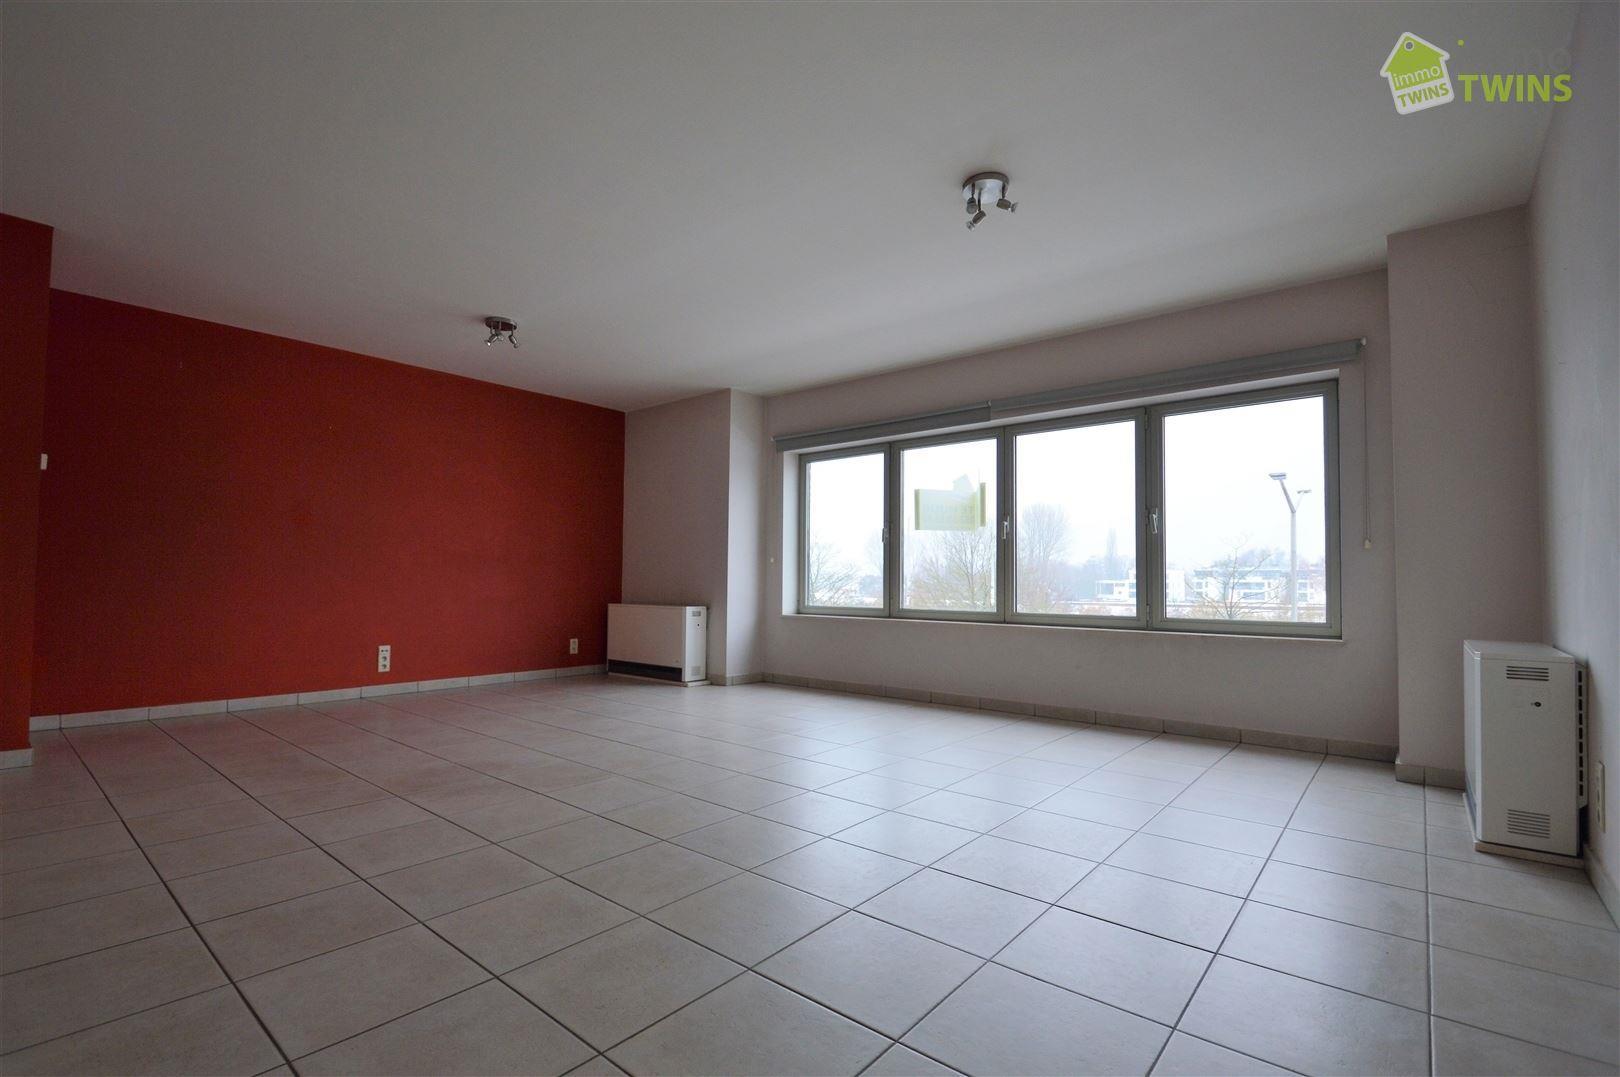 Foto 2 : Appartement te 9200 DENDERMONDE (België) - Prijs € 590